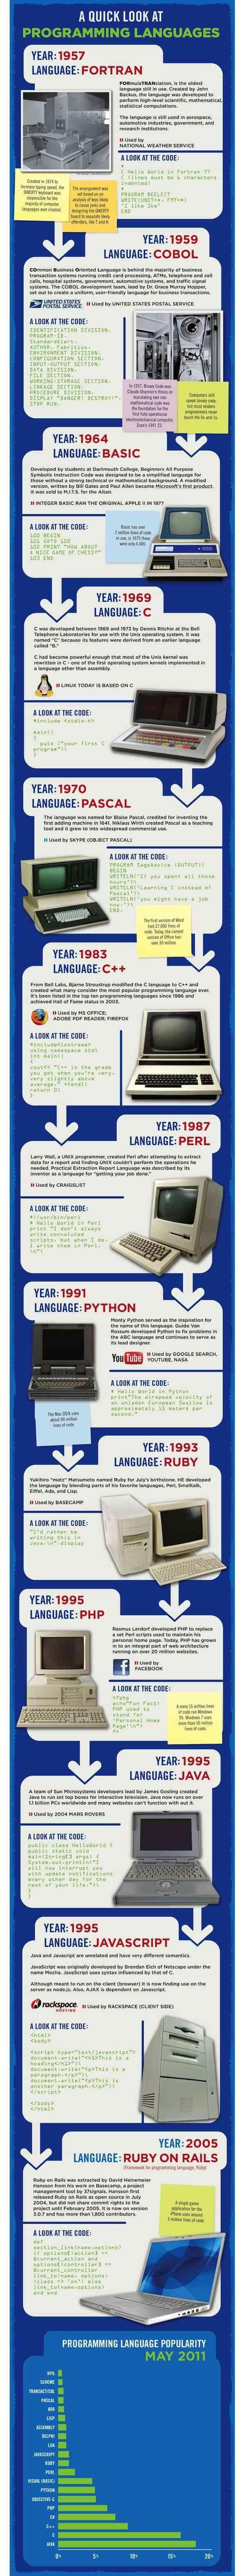 evolucion de lenguajes de programacion